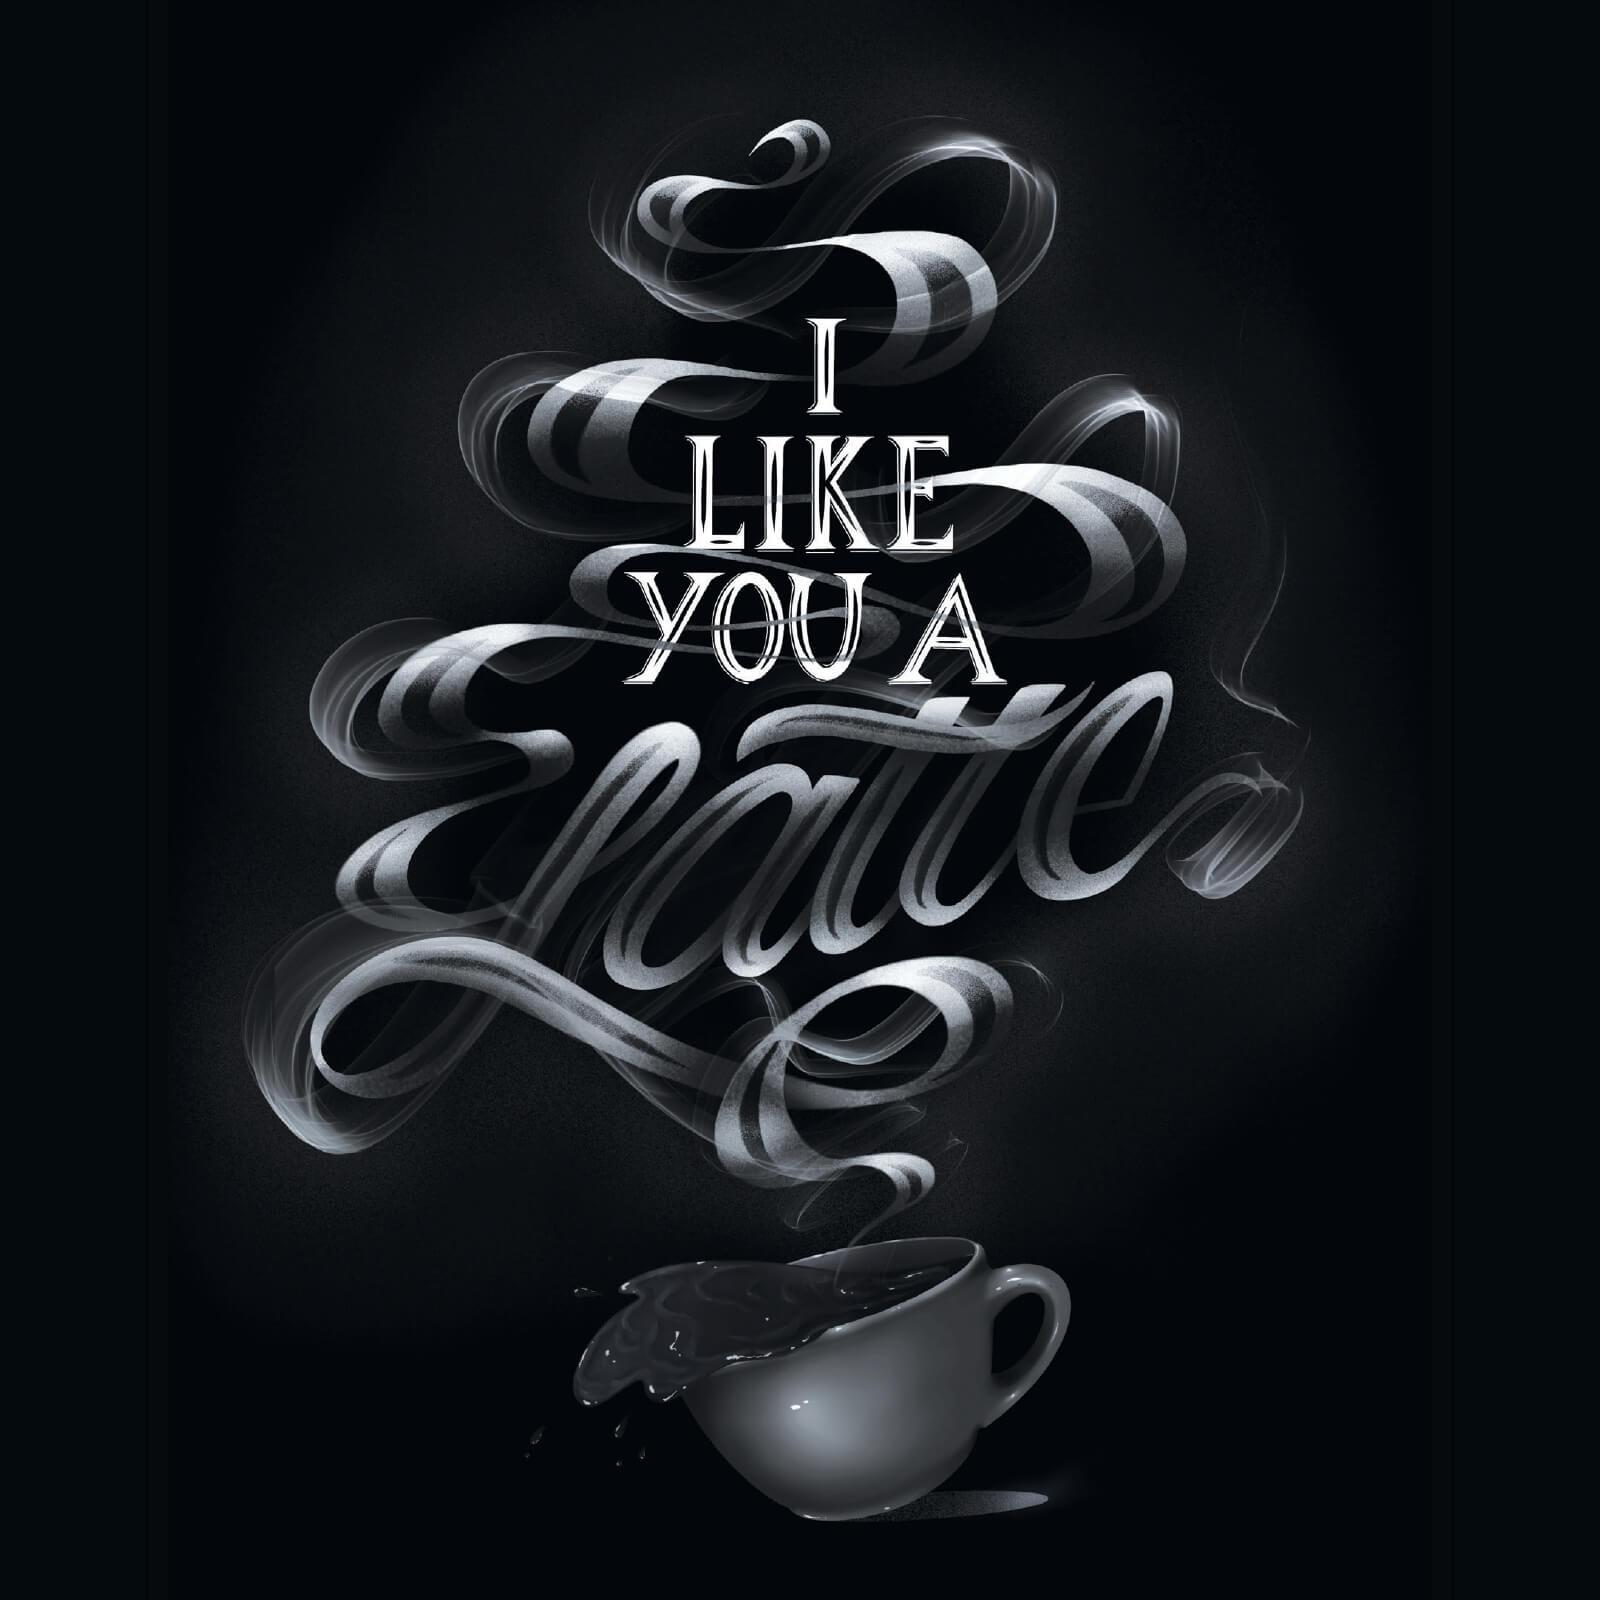 I Like You a Latte - ClazDesign